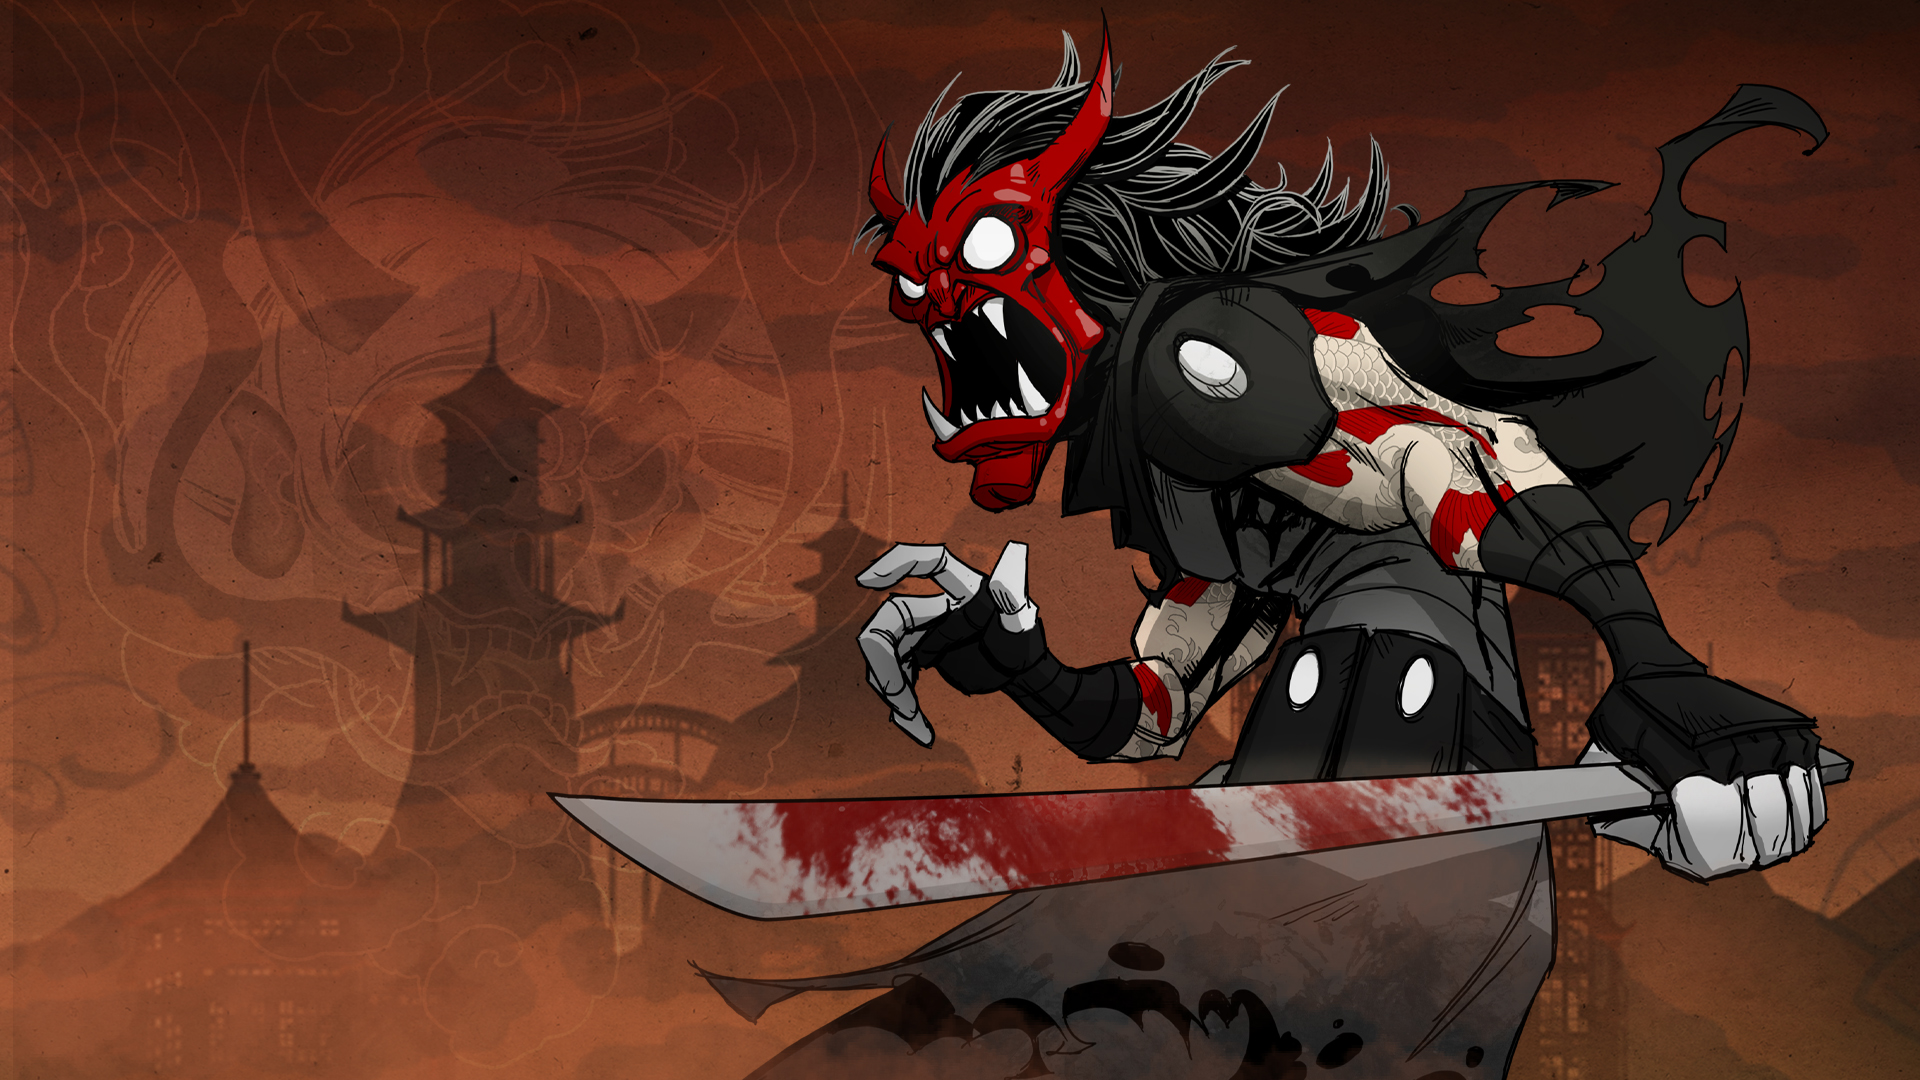 Drawn ninja demon Card :: Exchange of Ninja